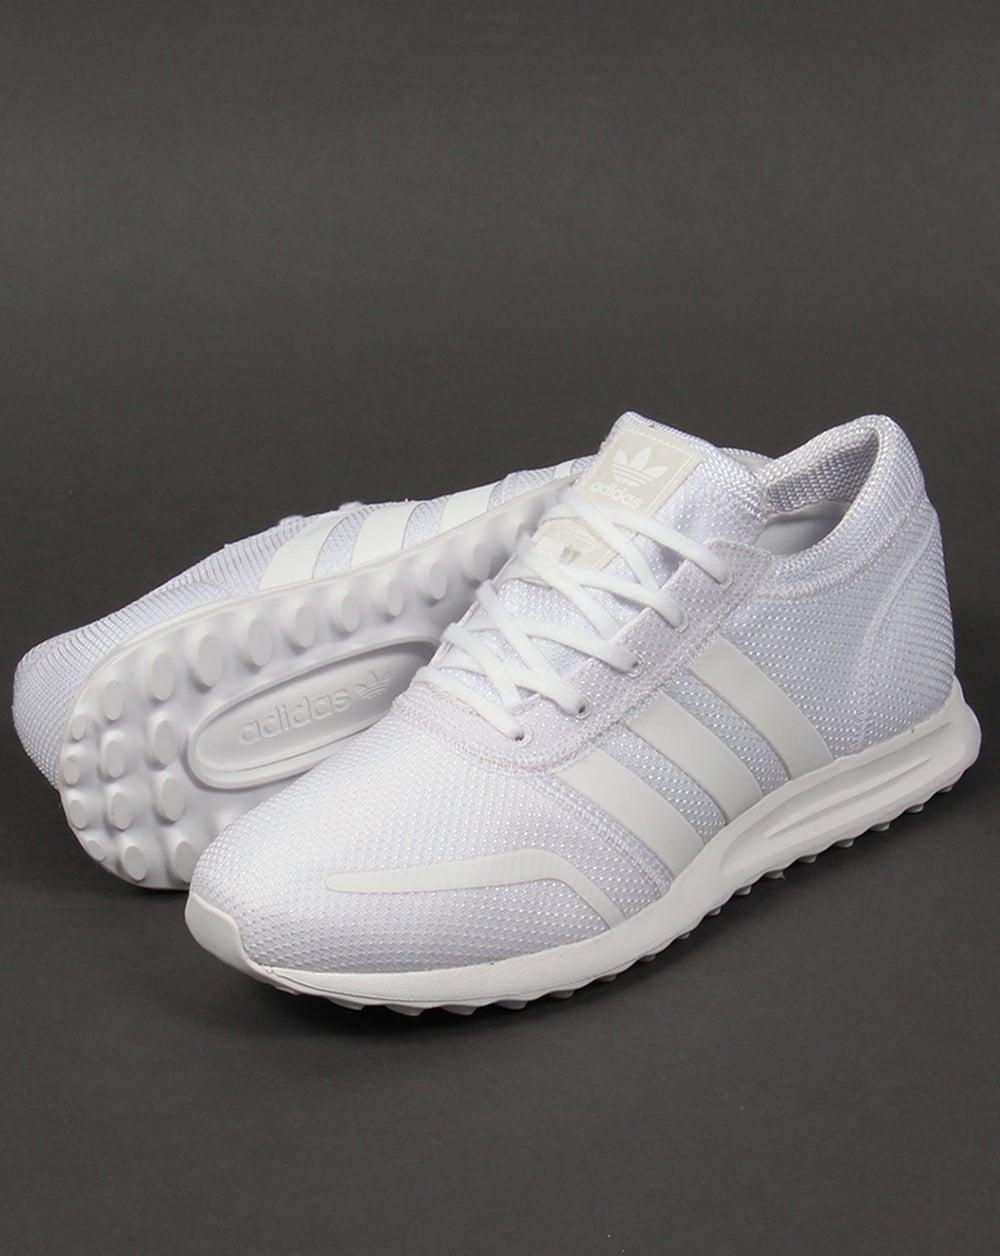 on sale bebcd ed719 Adidas Los Angeles White Trainers